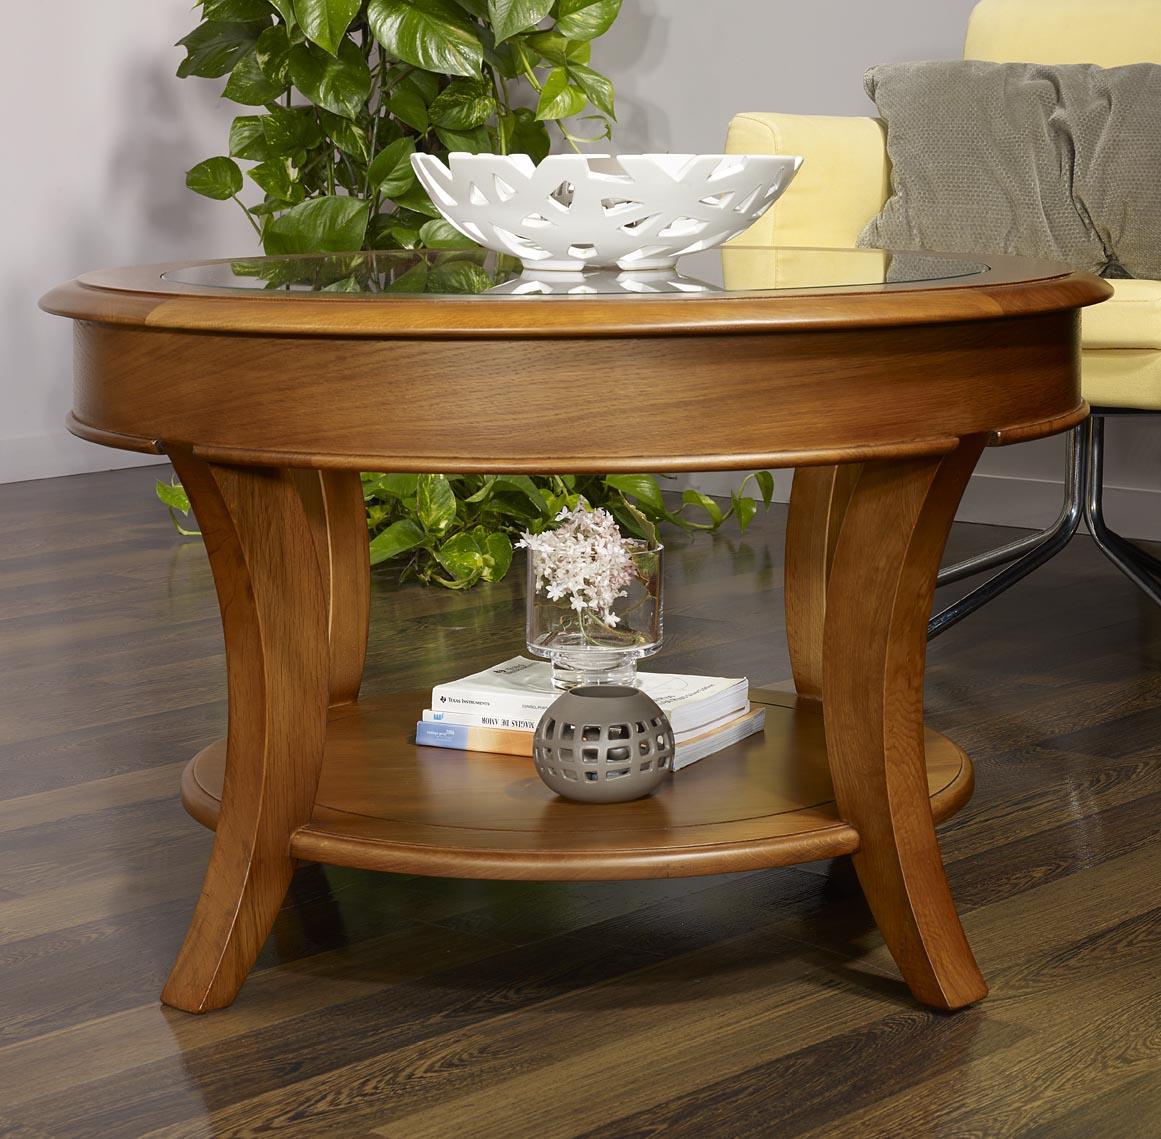 Table basse ronde ga l en ch ne massif de style louis philippe plateau verre - Table basse ronde chene ...